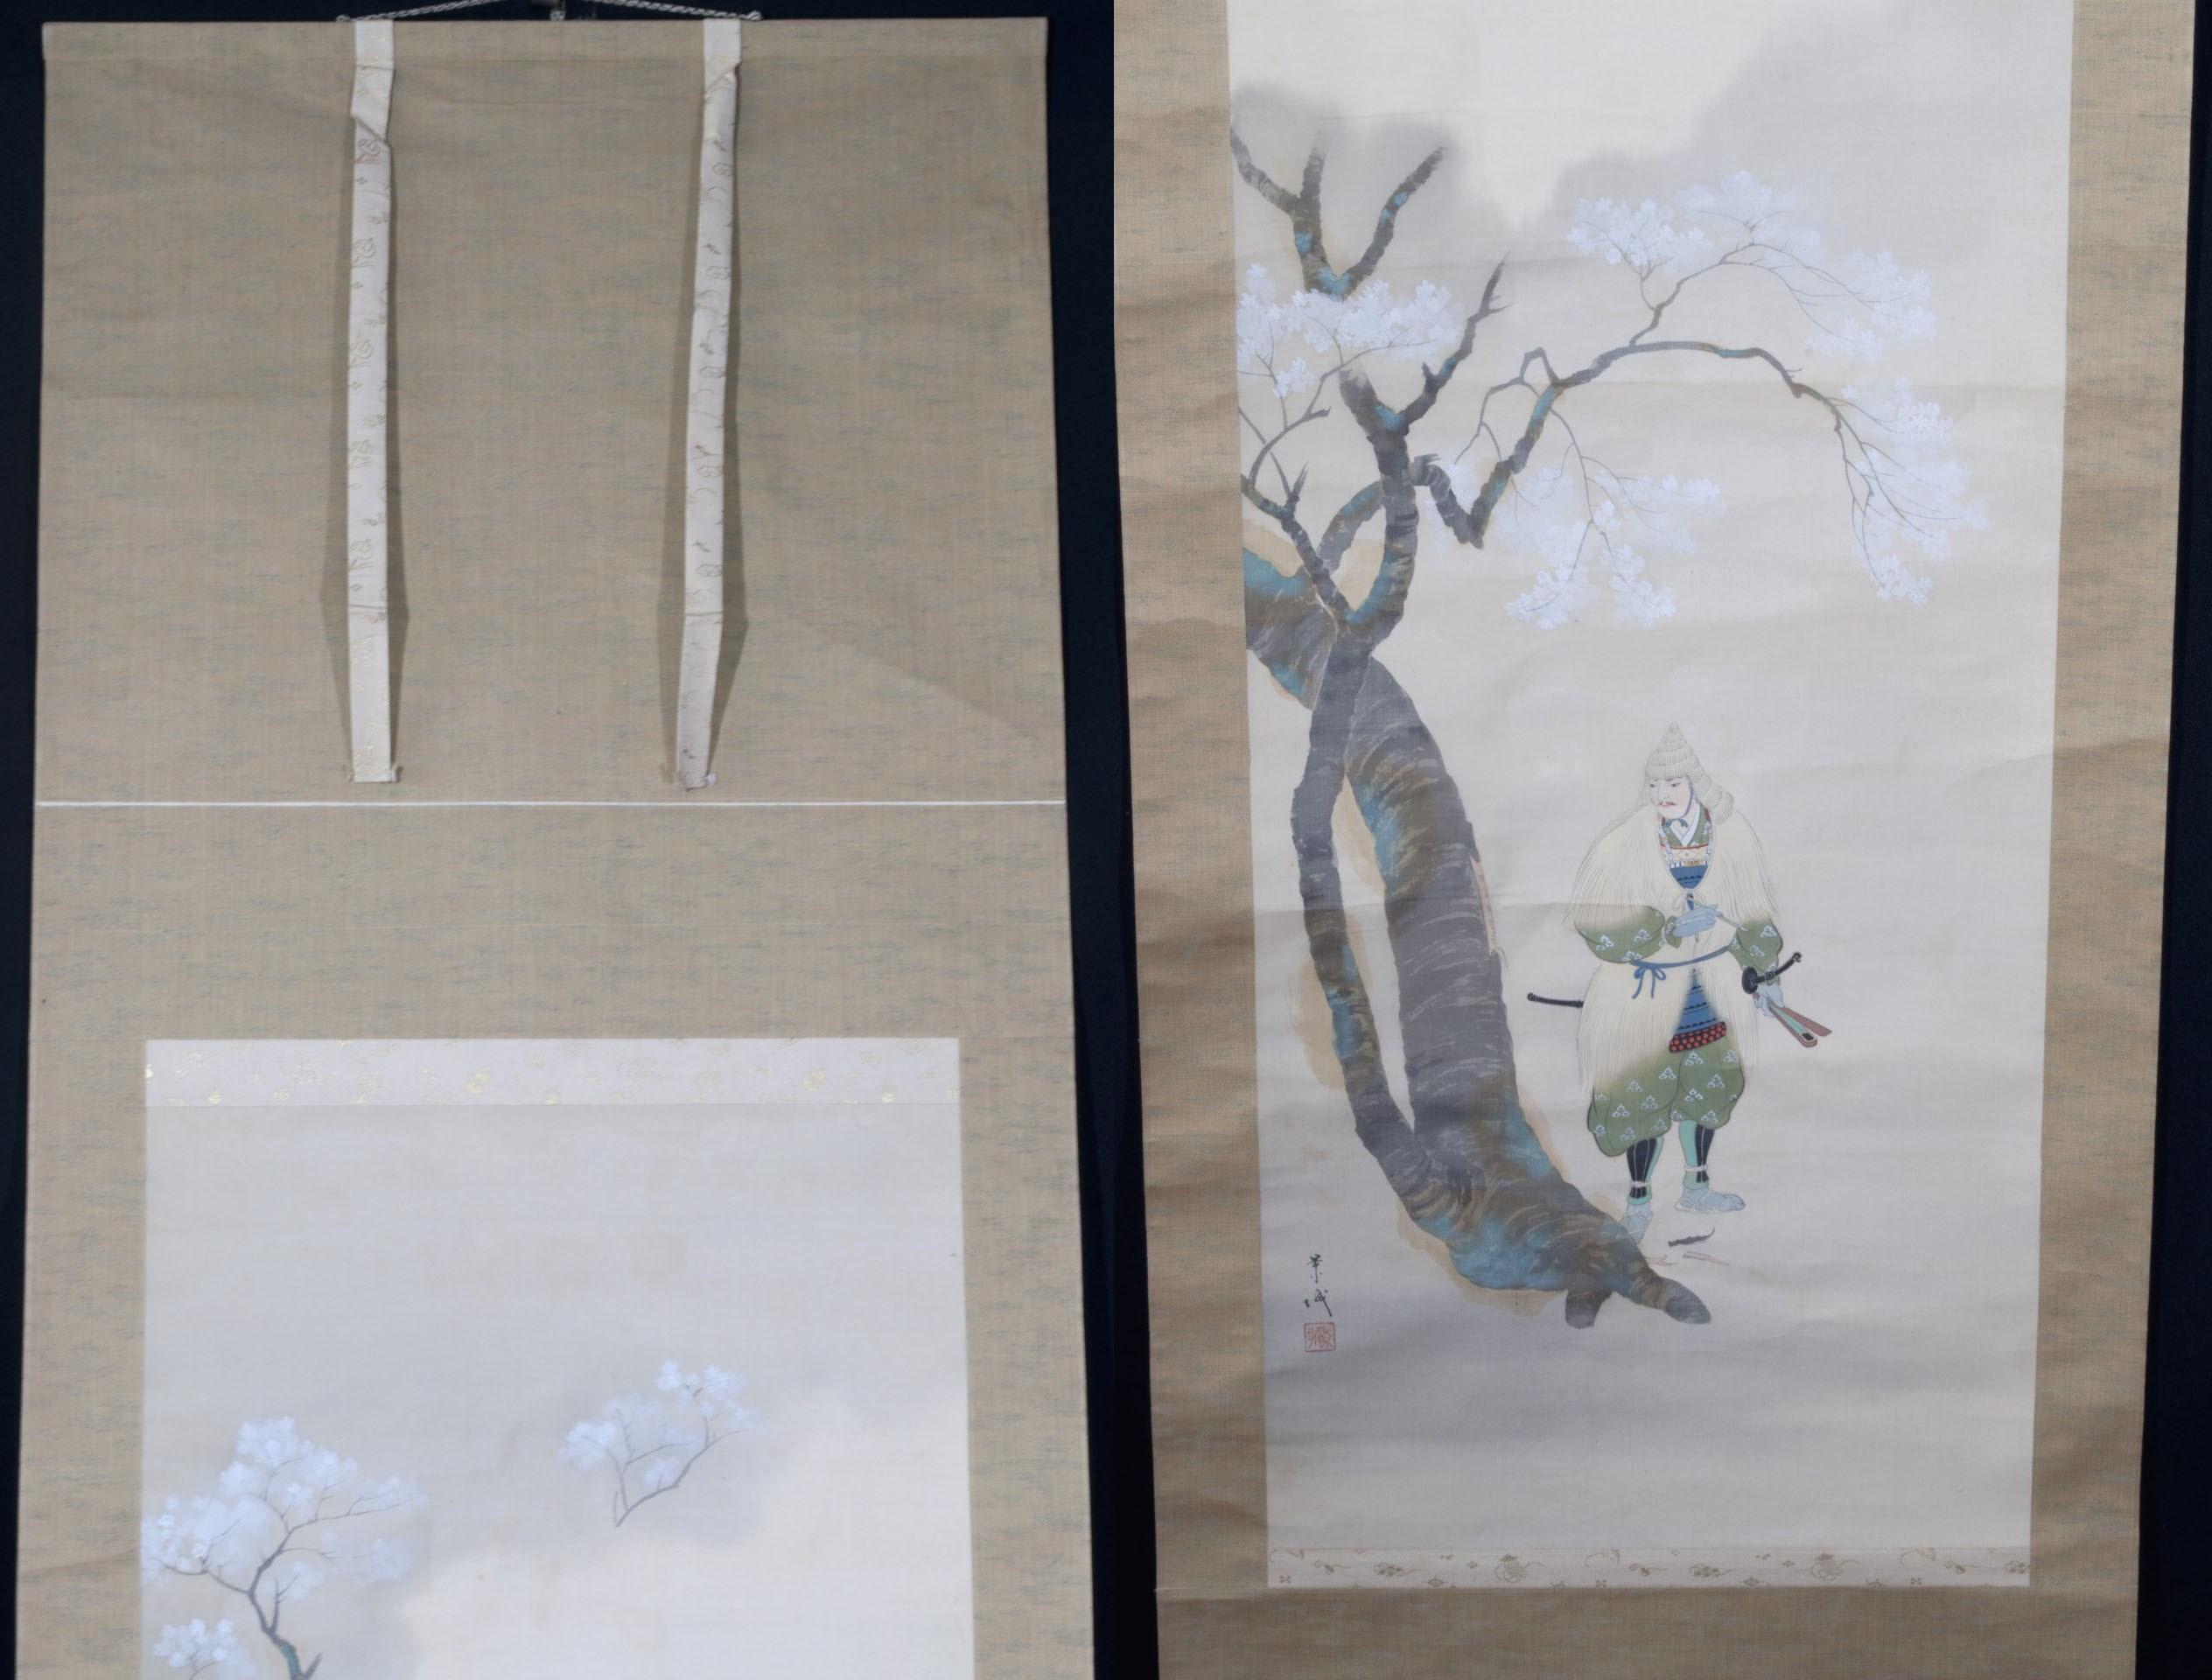 Kakejiku Kakemono Samourai et sakura parchemin japonais (2)